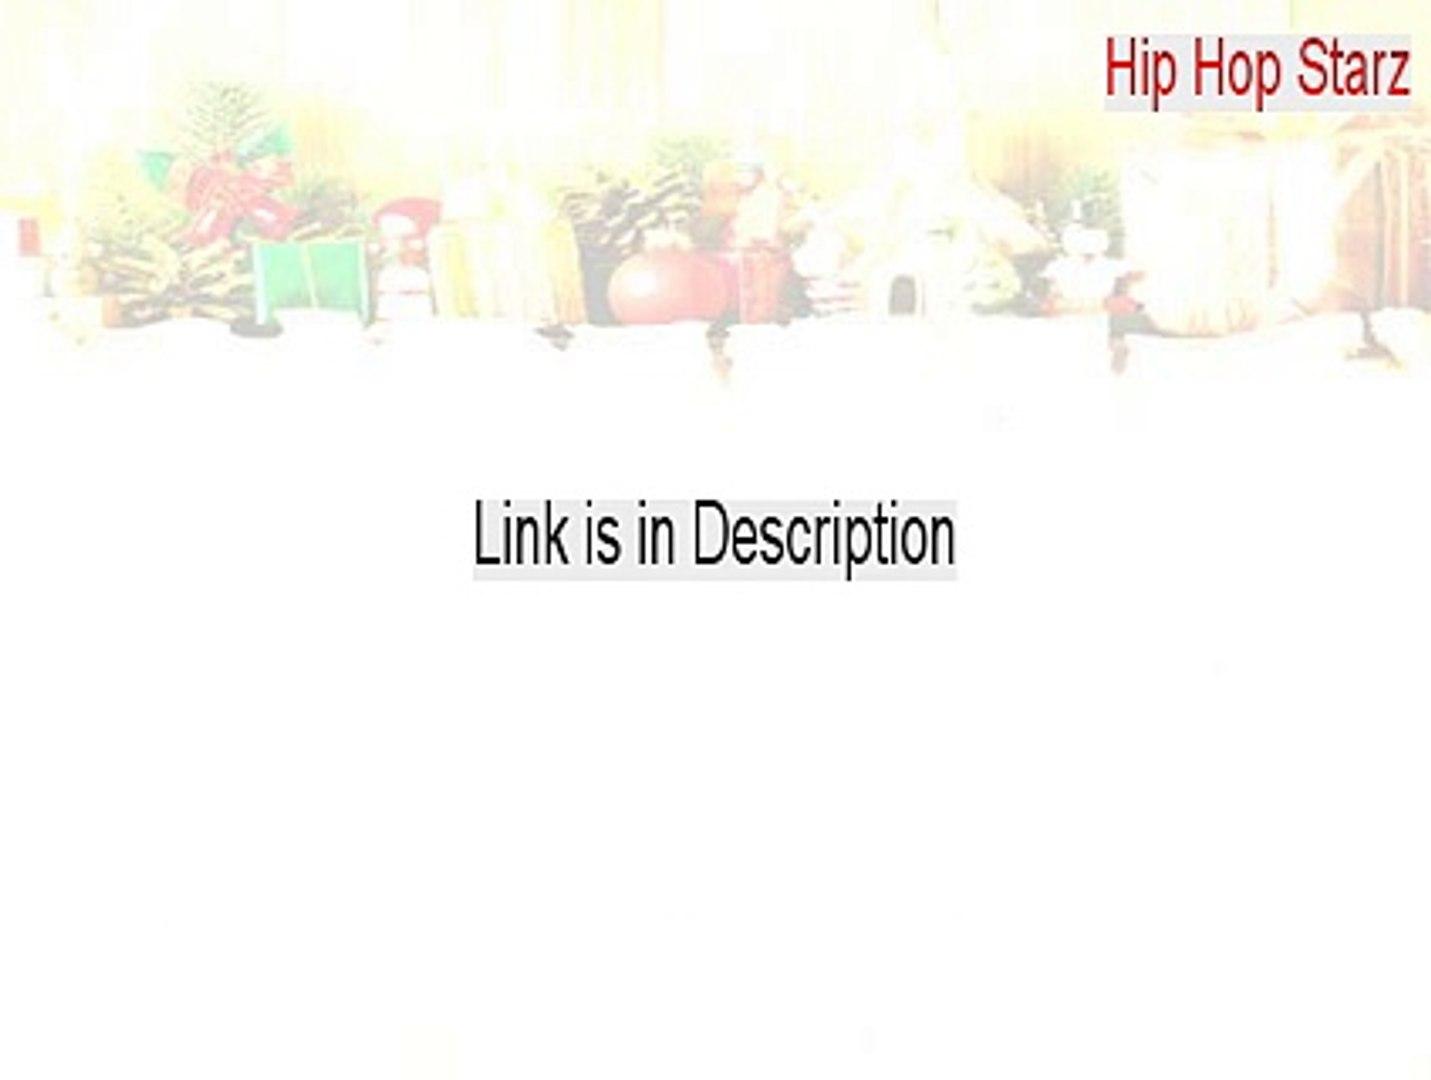 Hip Hop Starz Keygen - hip hop starz producer free download (2015)